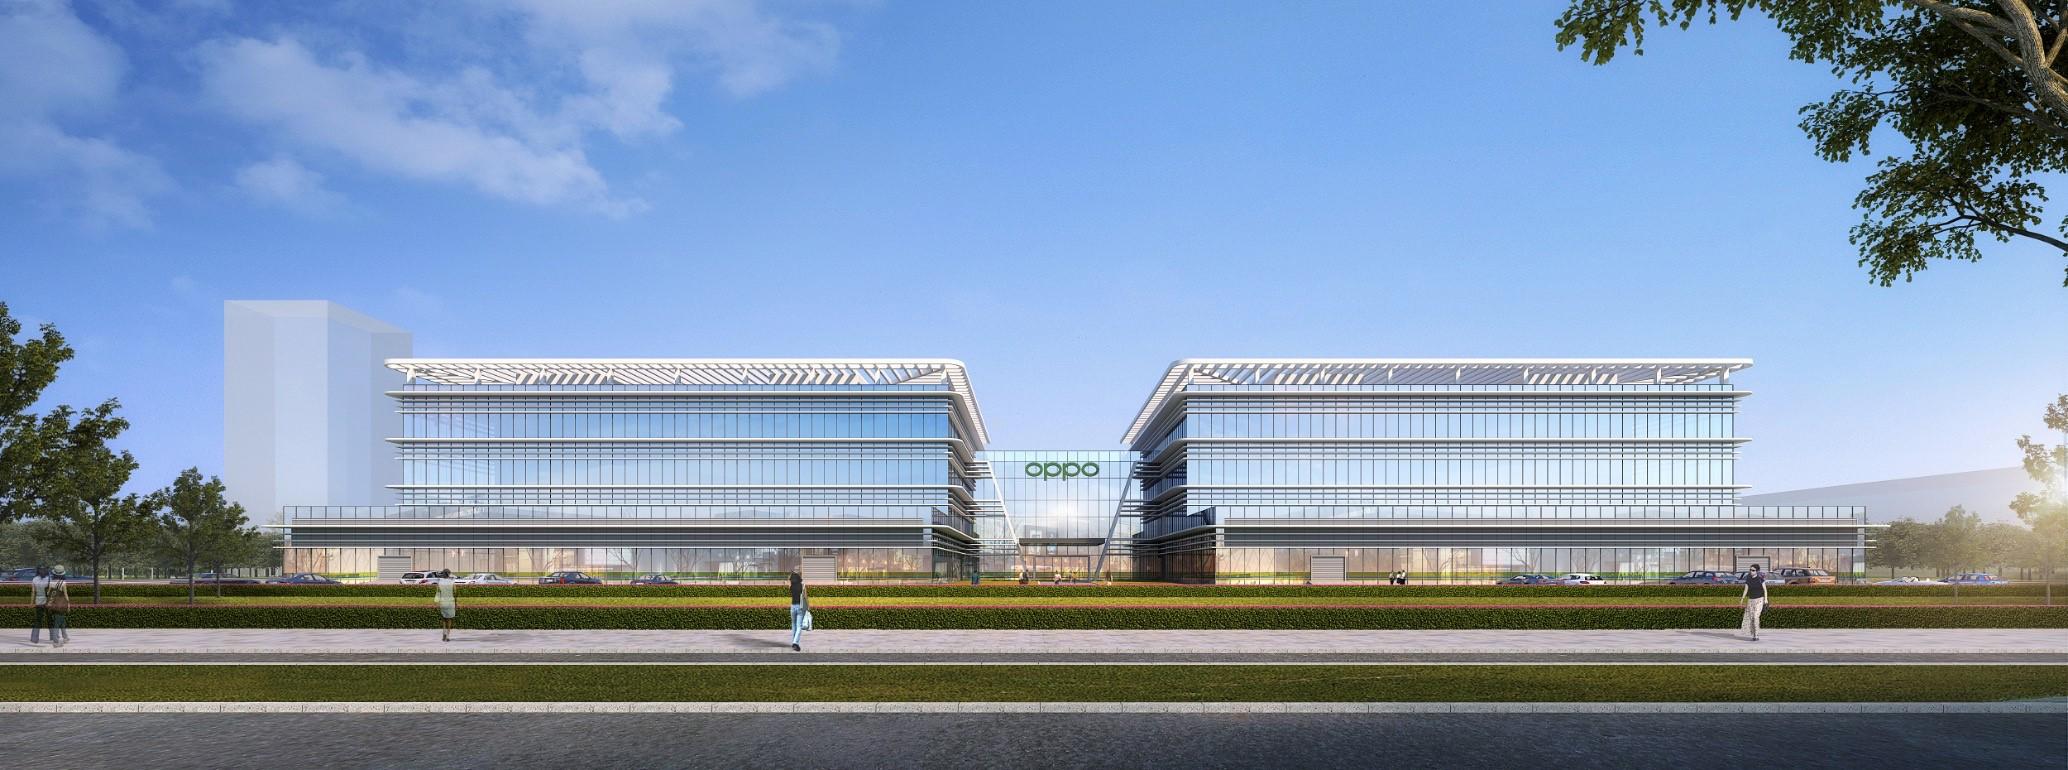 "OPPO滨海湾数据中心A栋获评""碳中和数据中心创新者""评级"